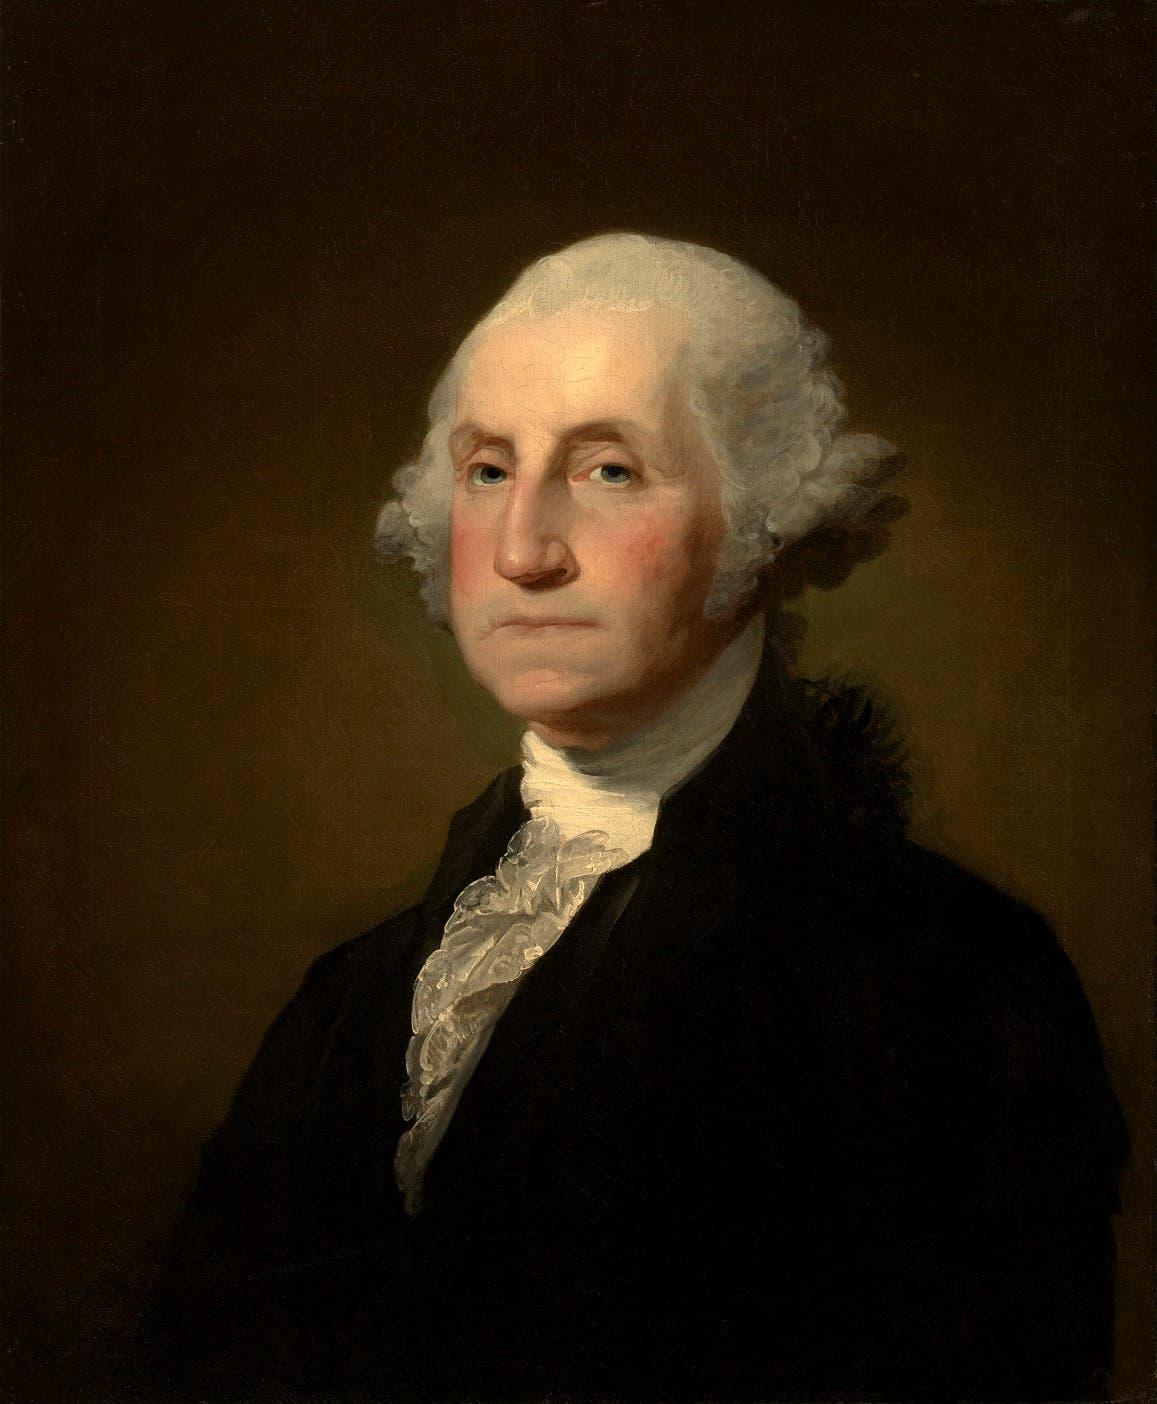 صورة للرئيس جورج واشنطن